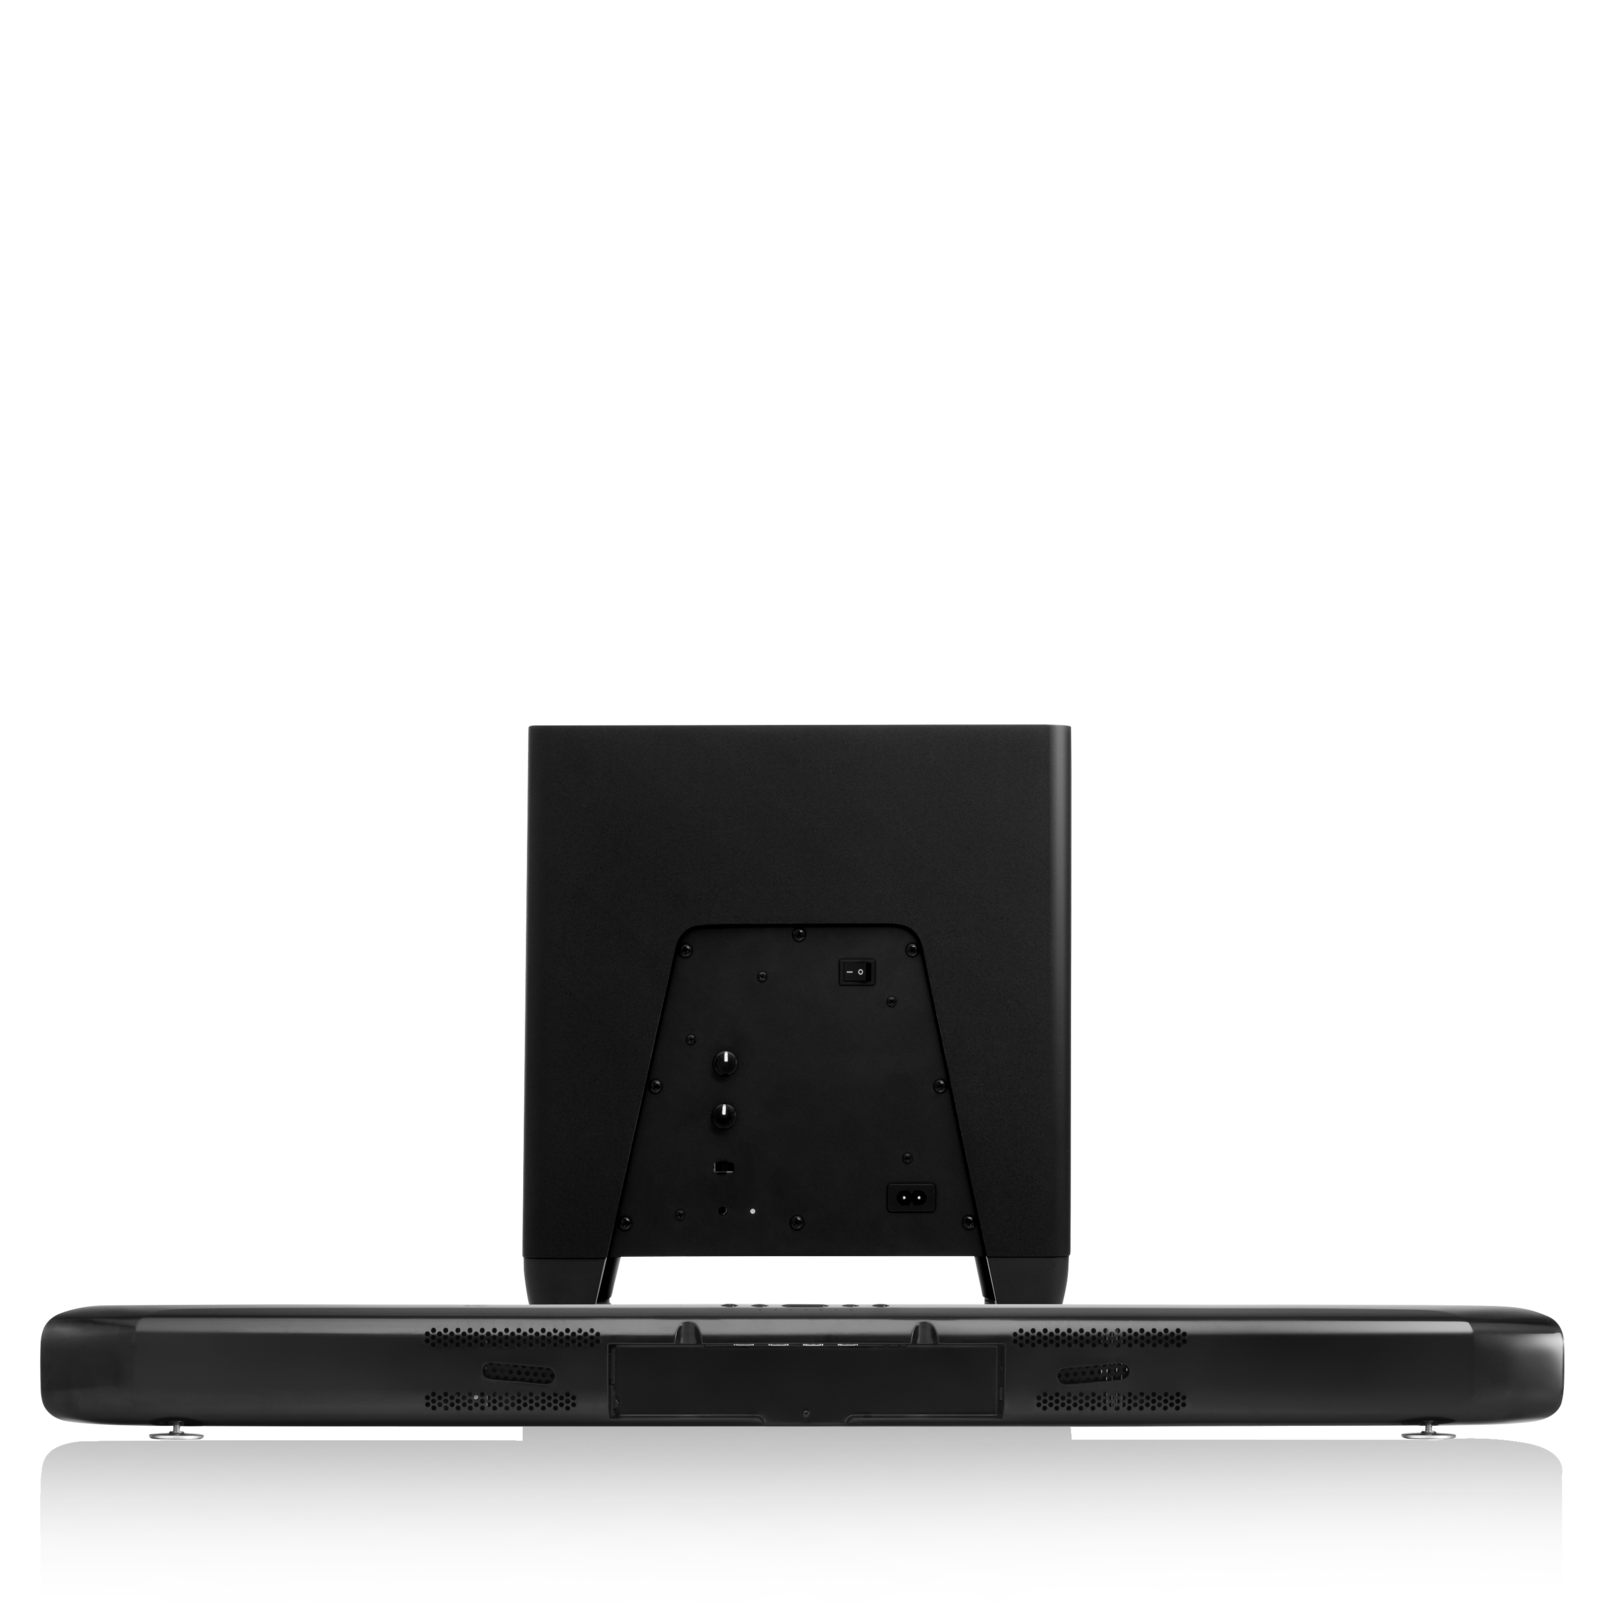 SB400_002_dvHAMaster cinema sb400 bluetooth soundbar speaker with wireless subwoofer Vizio VSB210WS Subwoofer at crackthecode.co